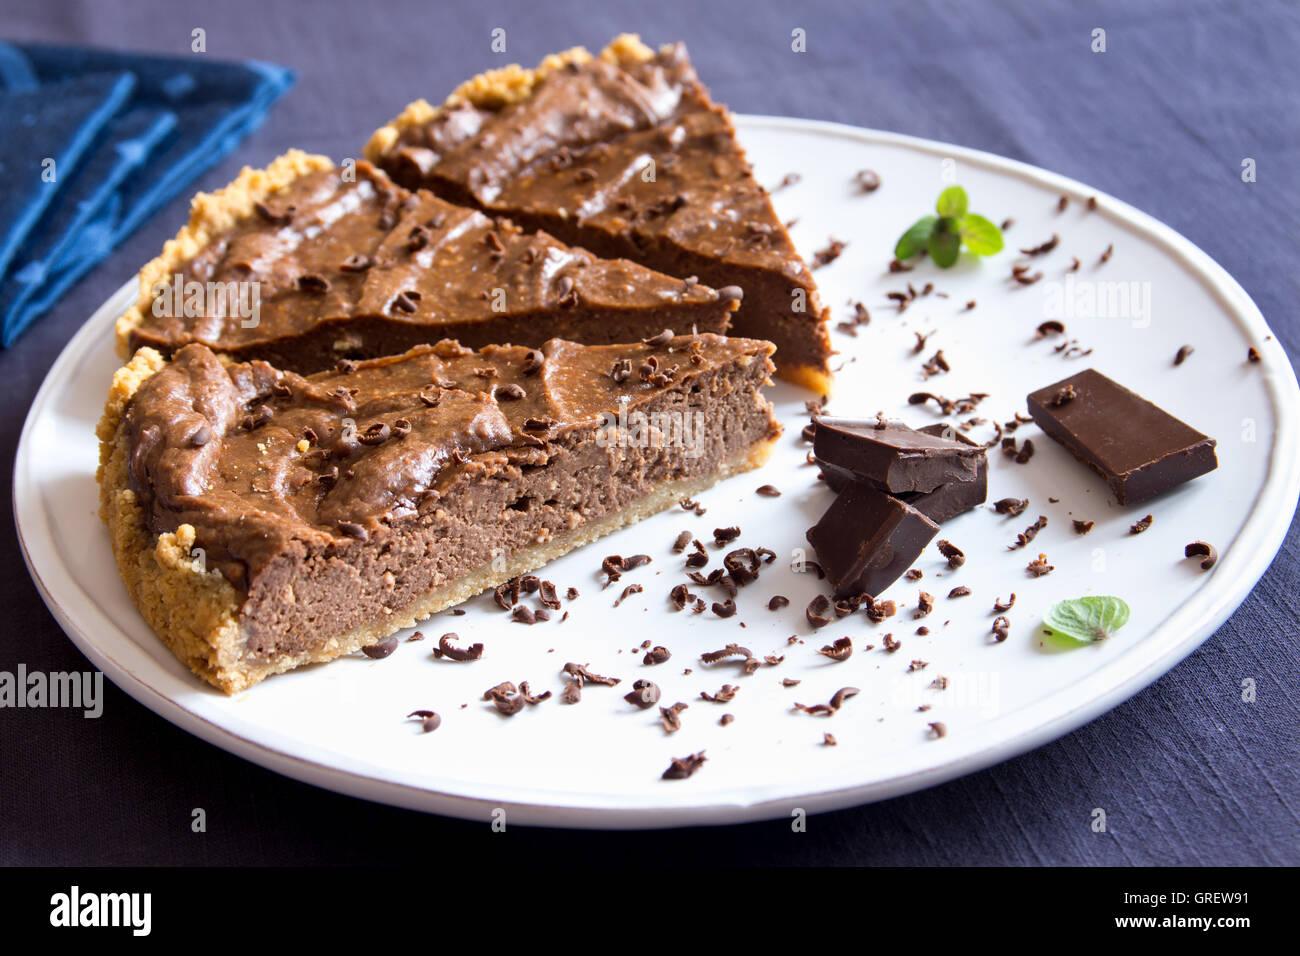 Homemade chocolate pie (cheesecake) on white plate close up - Stock Image